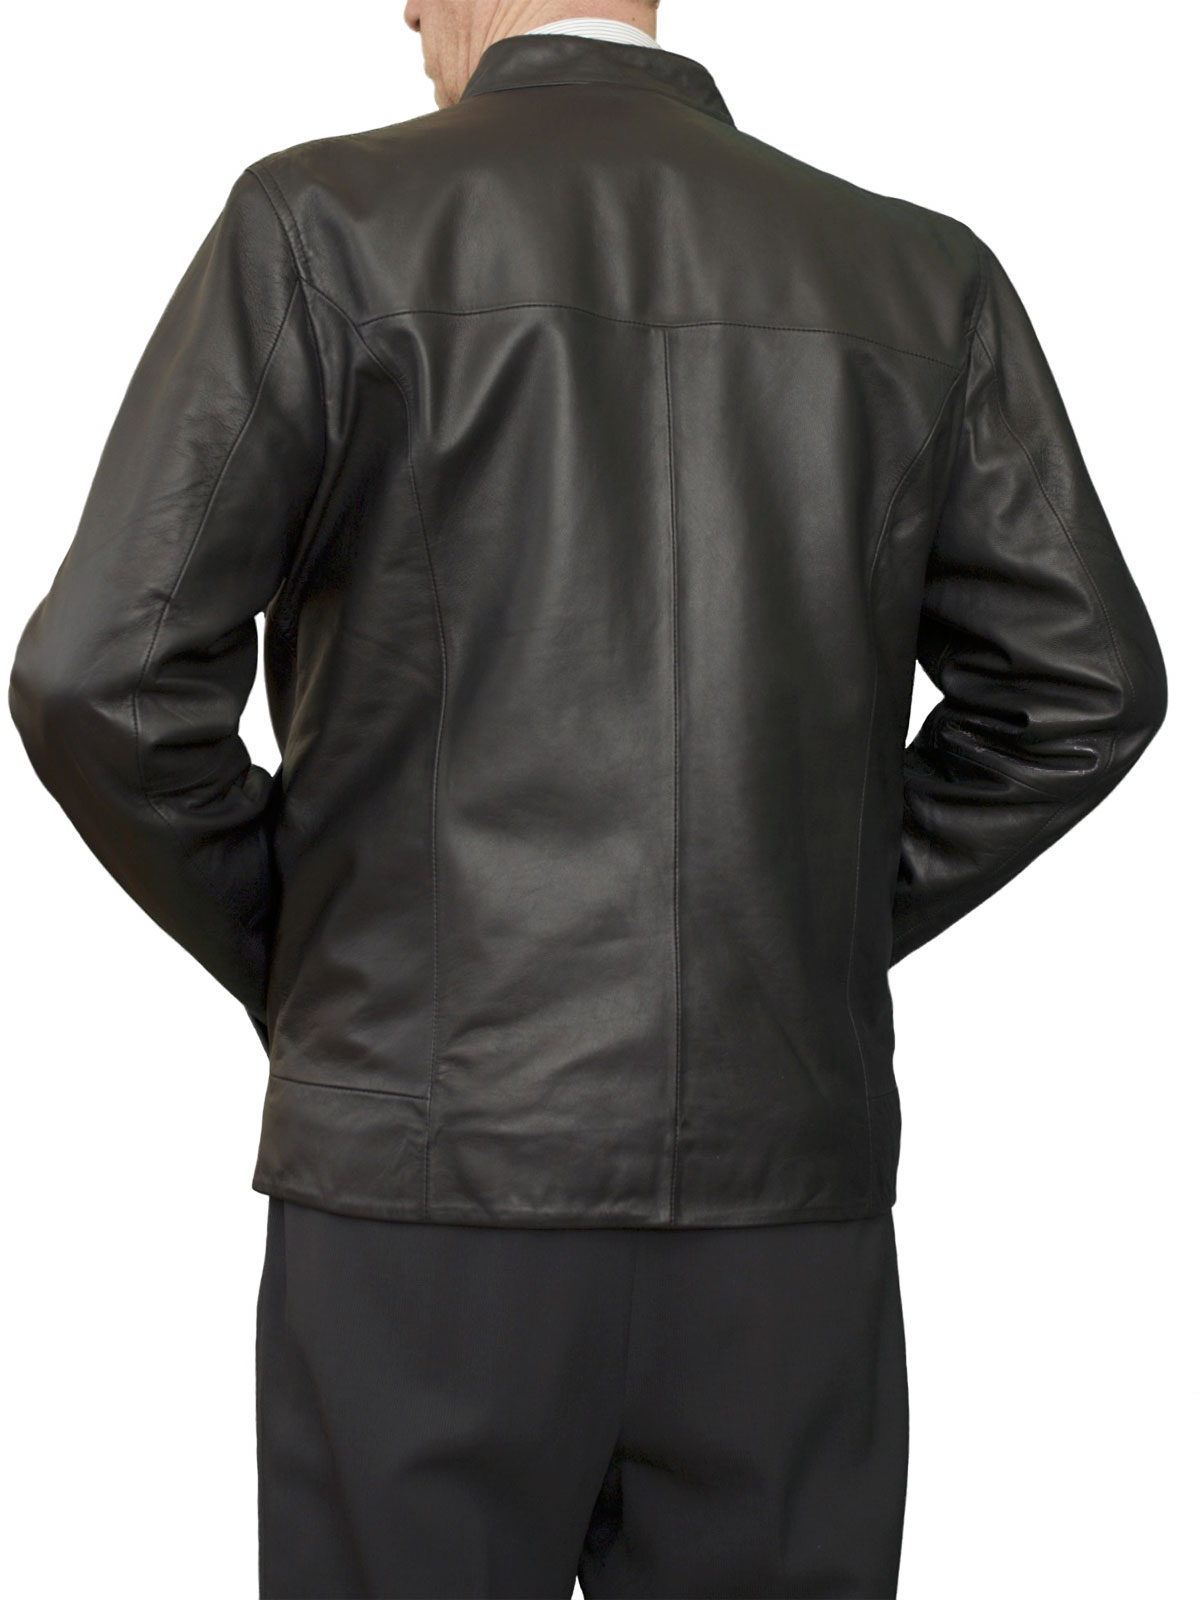 Mens Luxury Leather Bomber Jacket 3 Colours Tout Ensemble